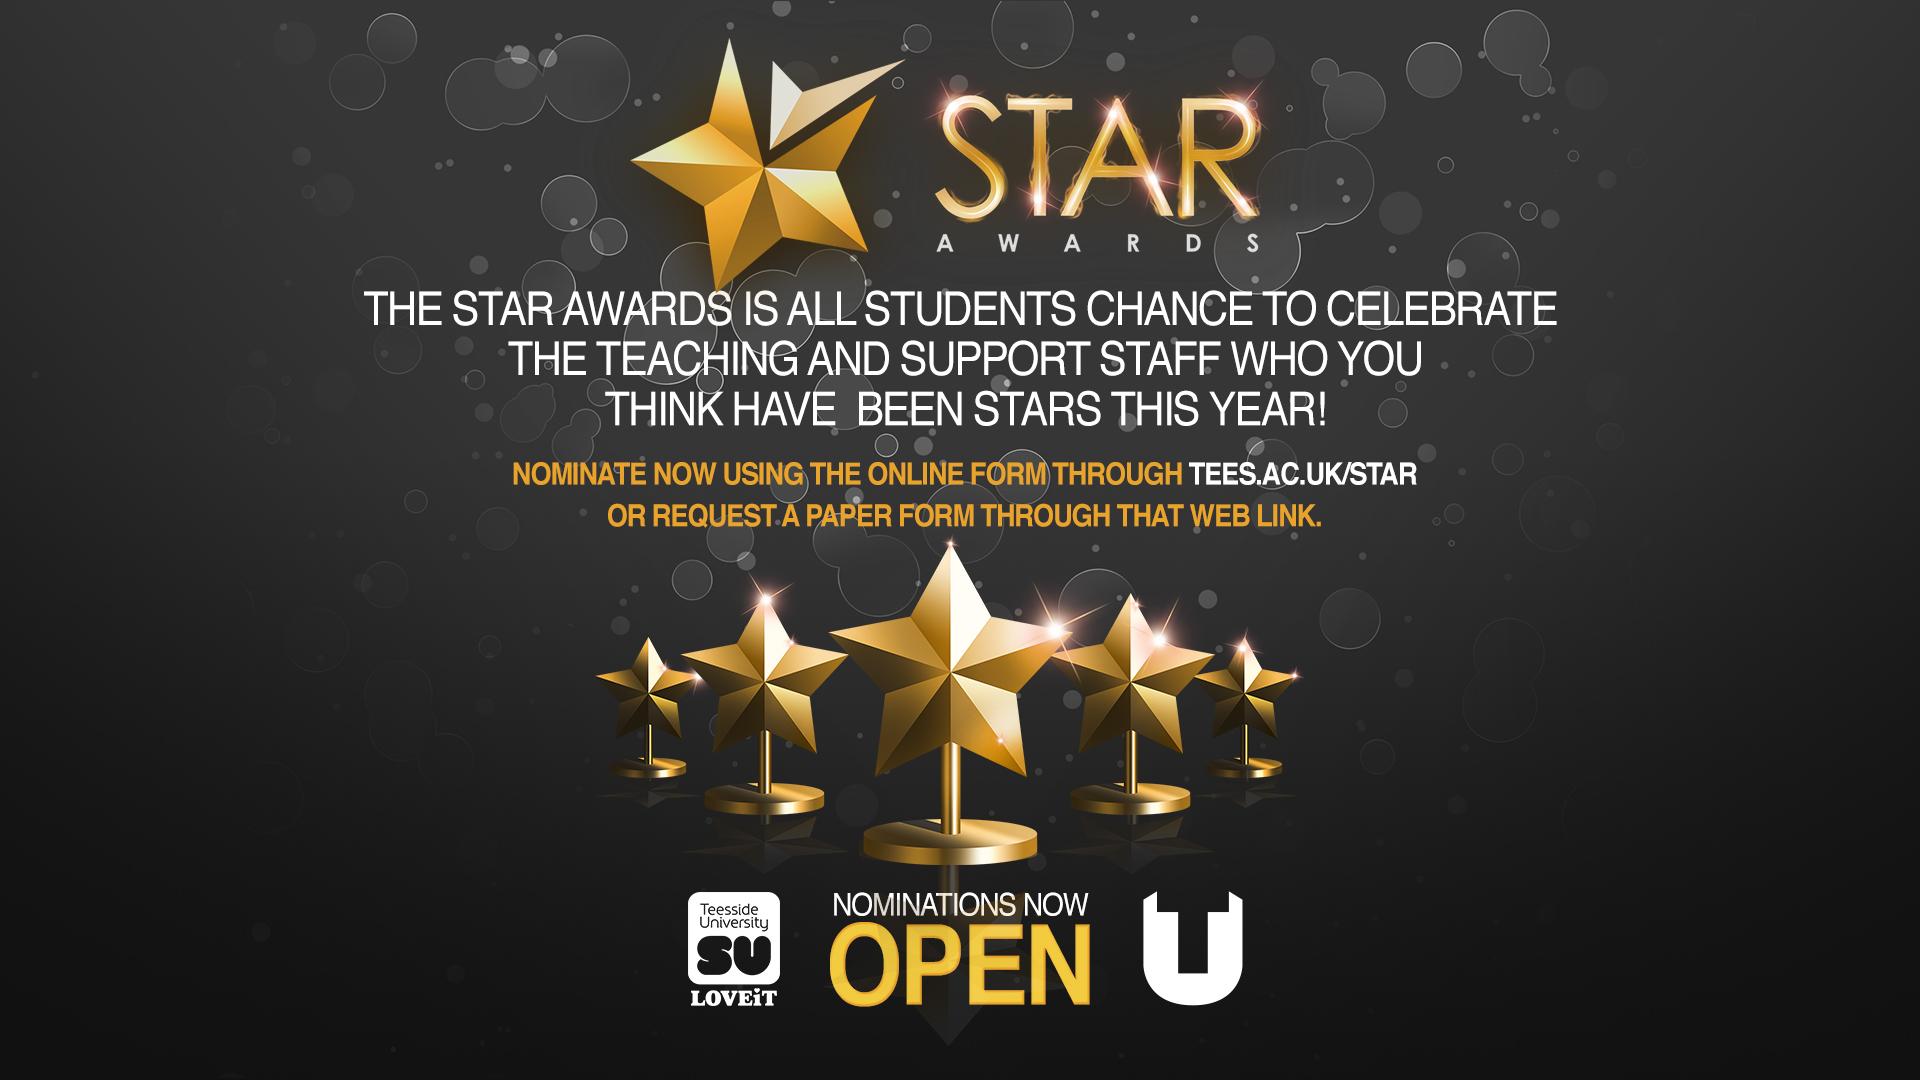 Star awards 2020 plasma